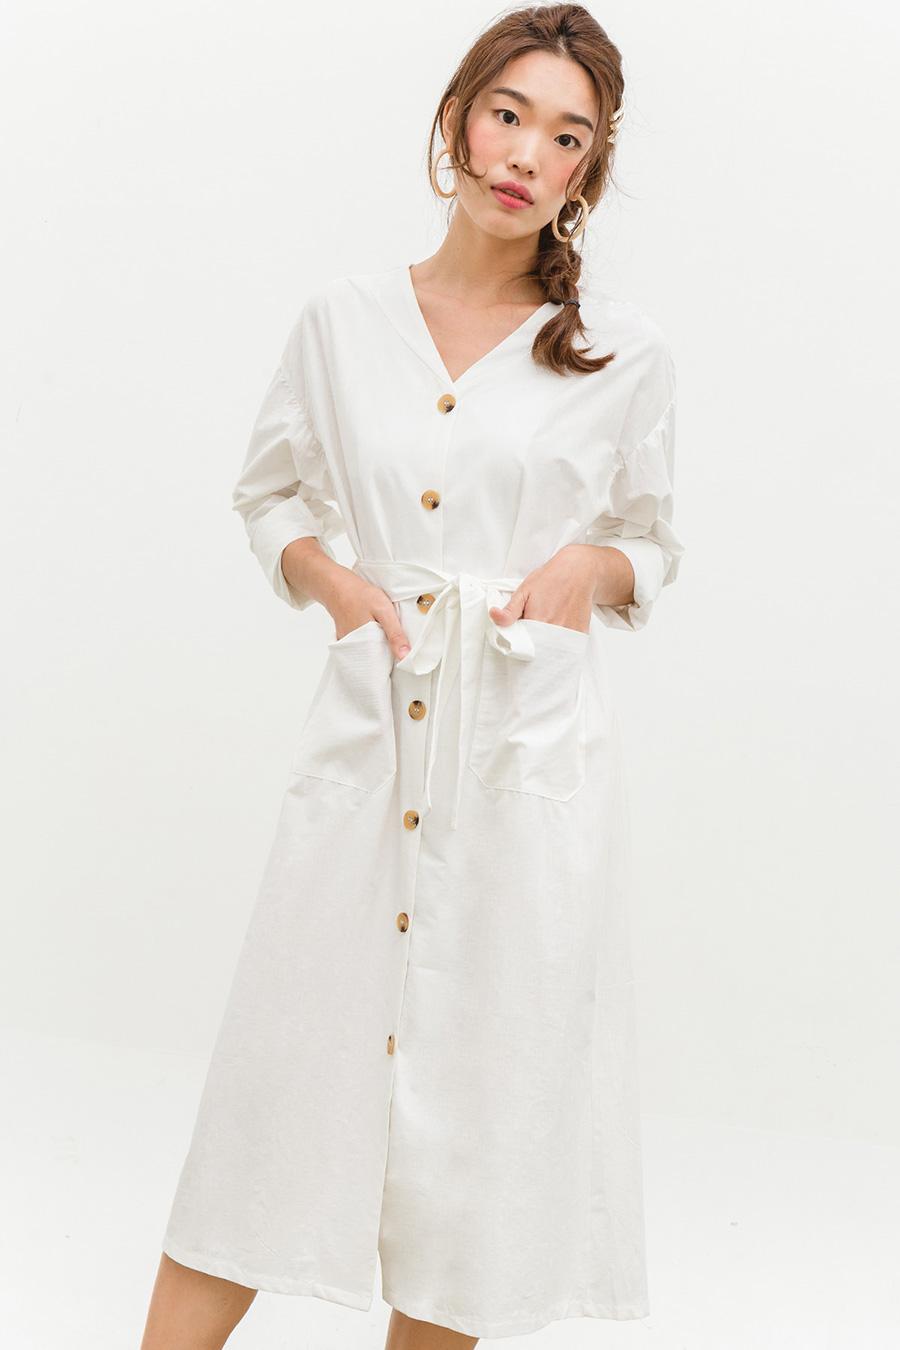 STANISLAV DRESS - IVORY